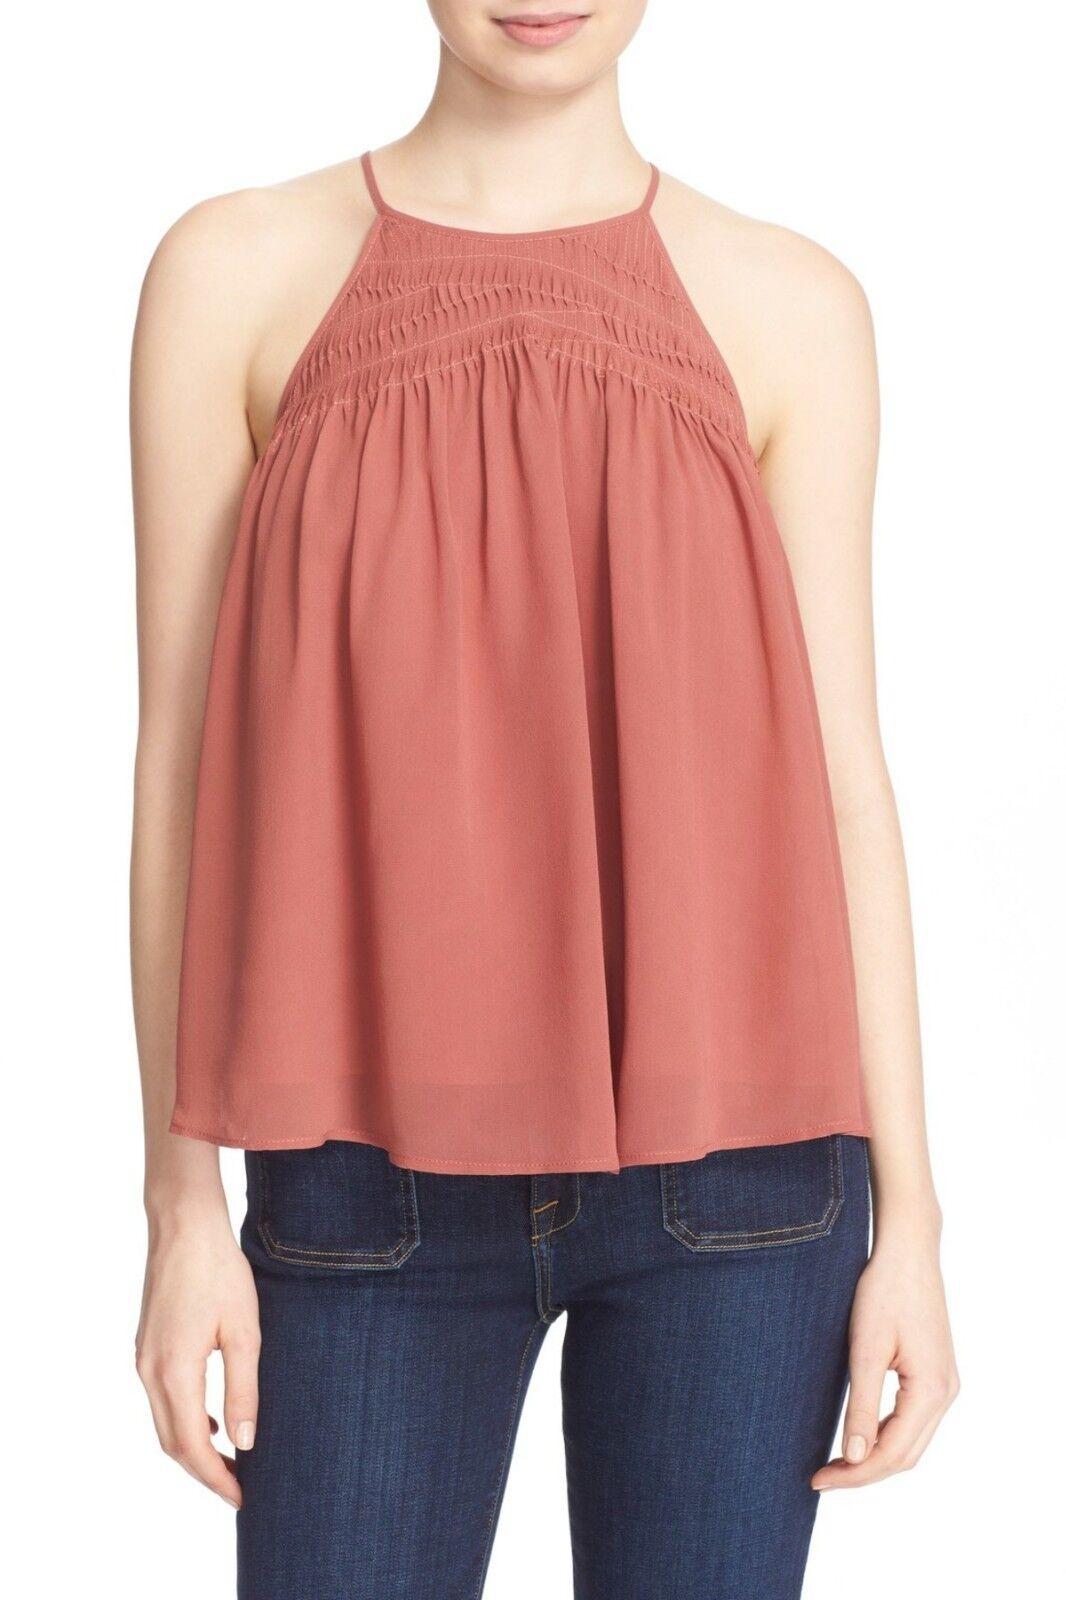 NWT- Joie Soseh Smocked Silk Sleeveless Top, Burnt Terracotta - Größe Small